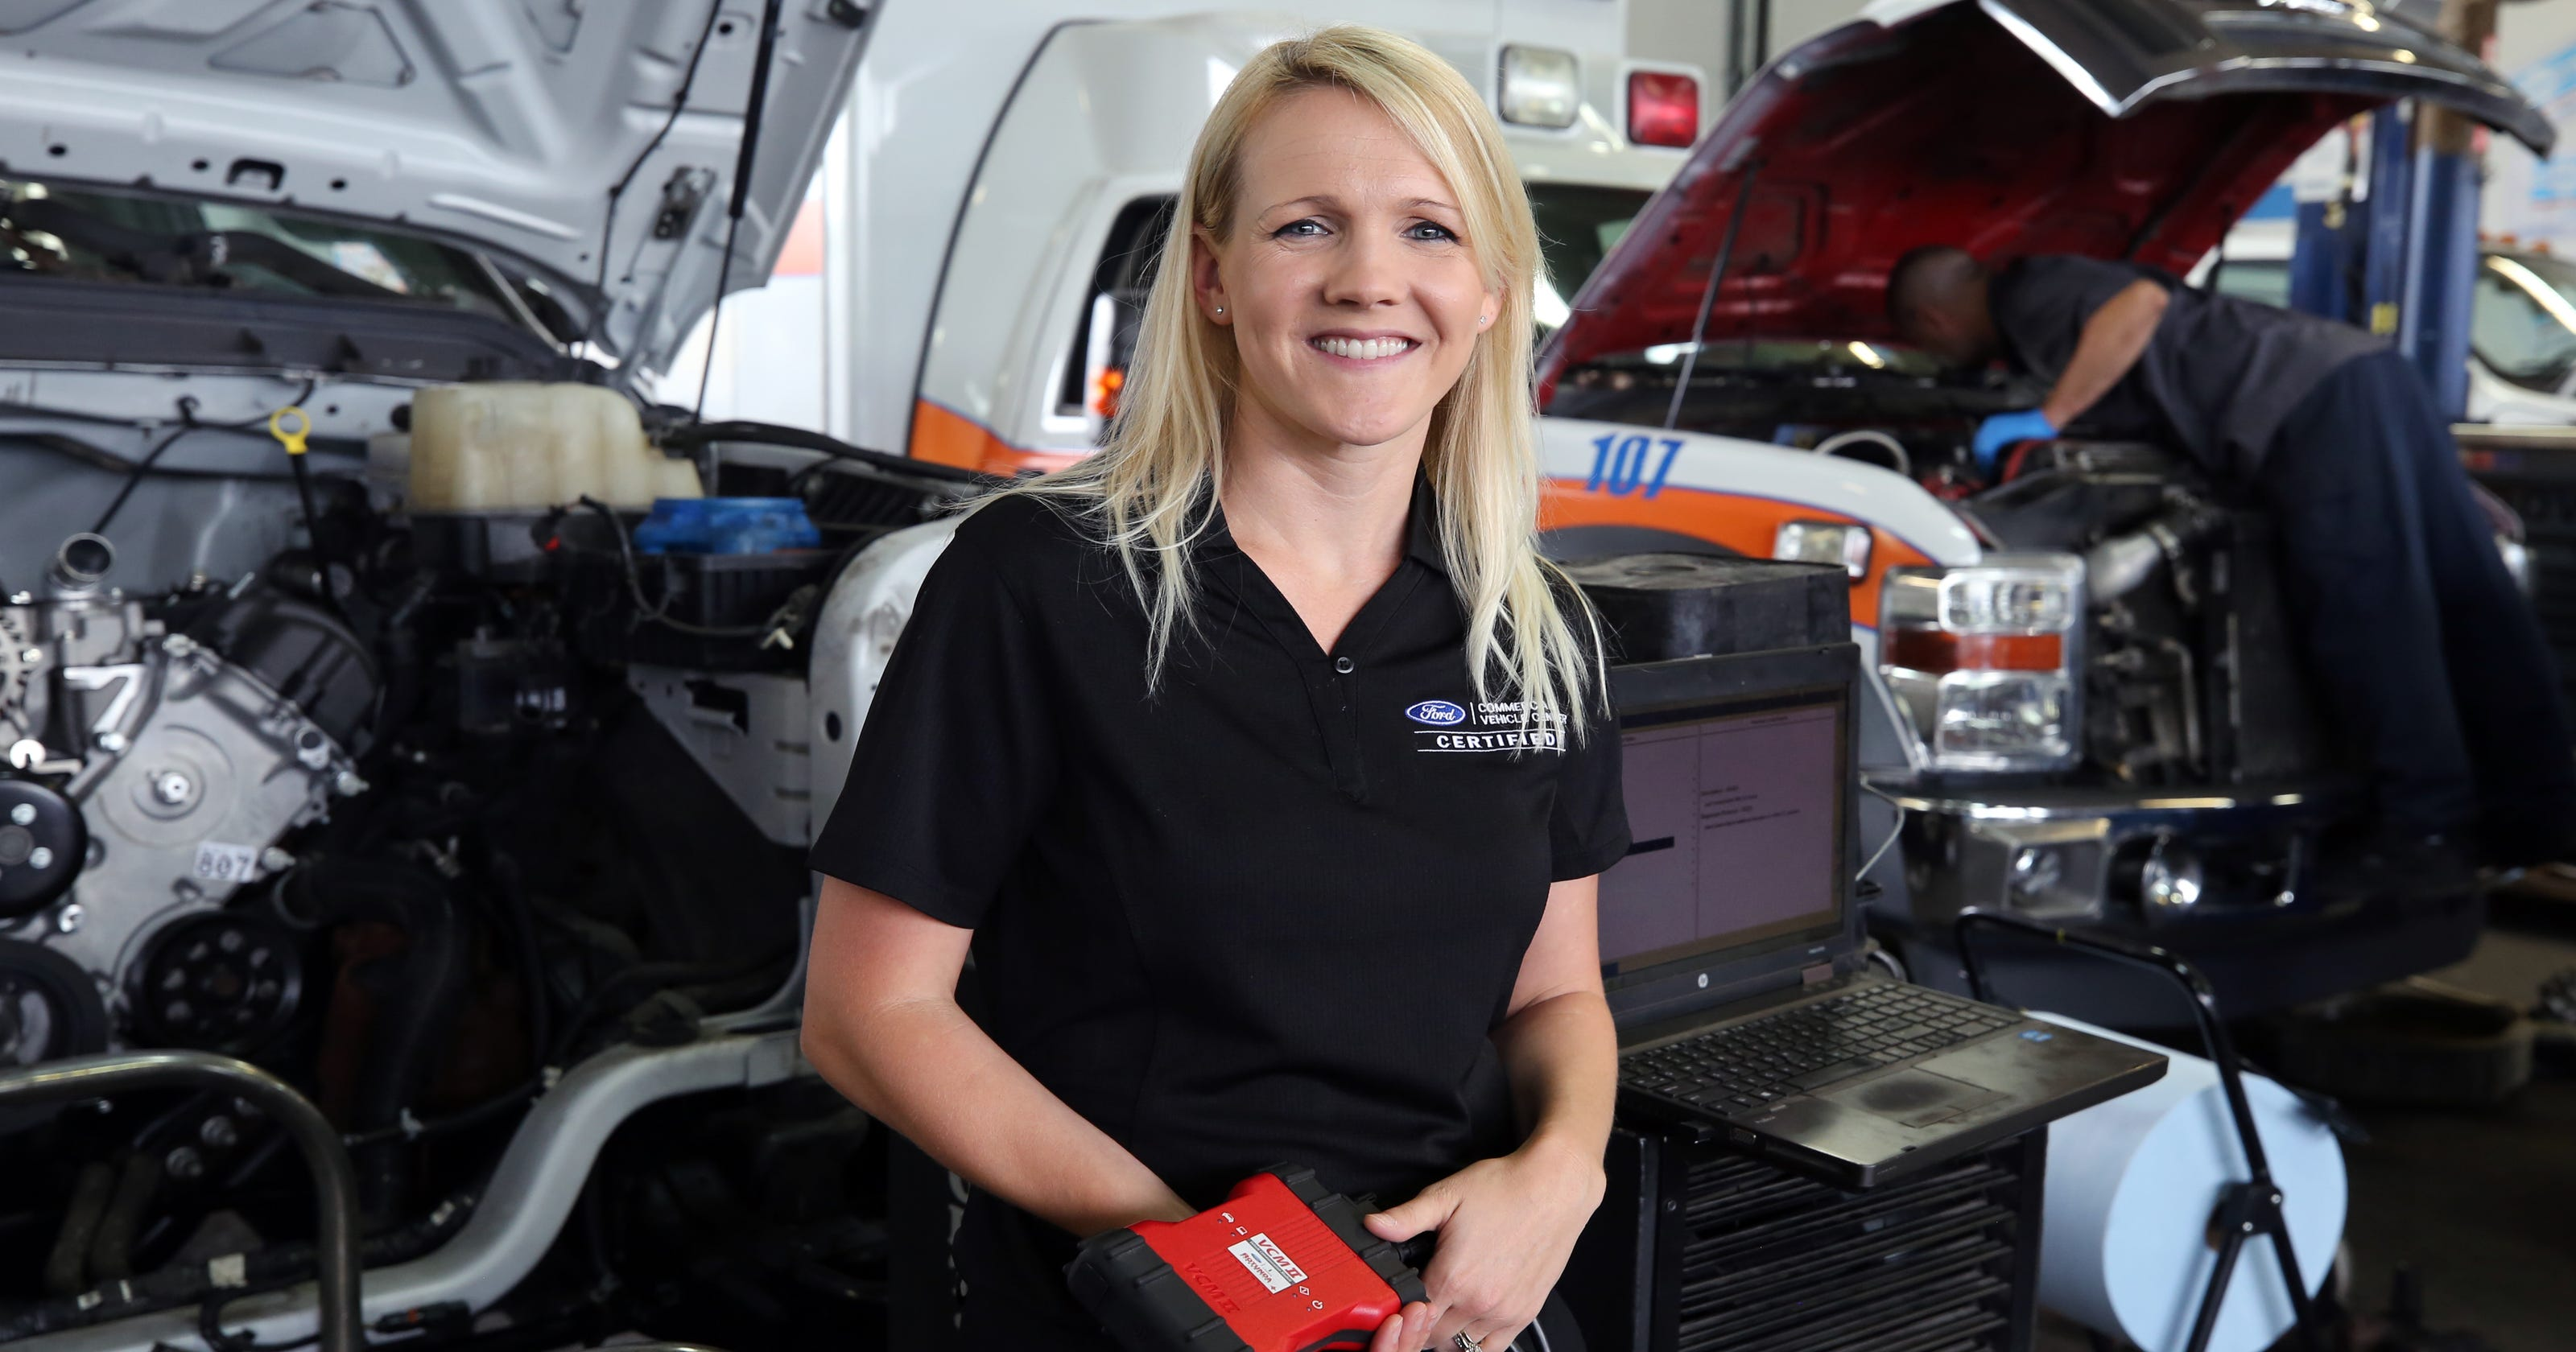 Auto dealers scramble to find enough service technicians